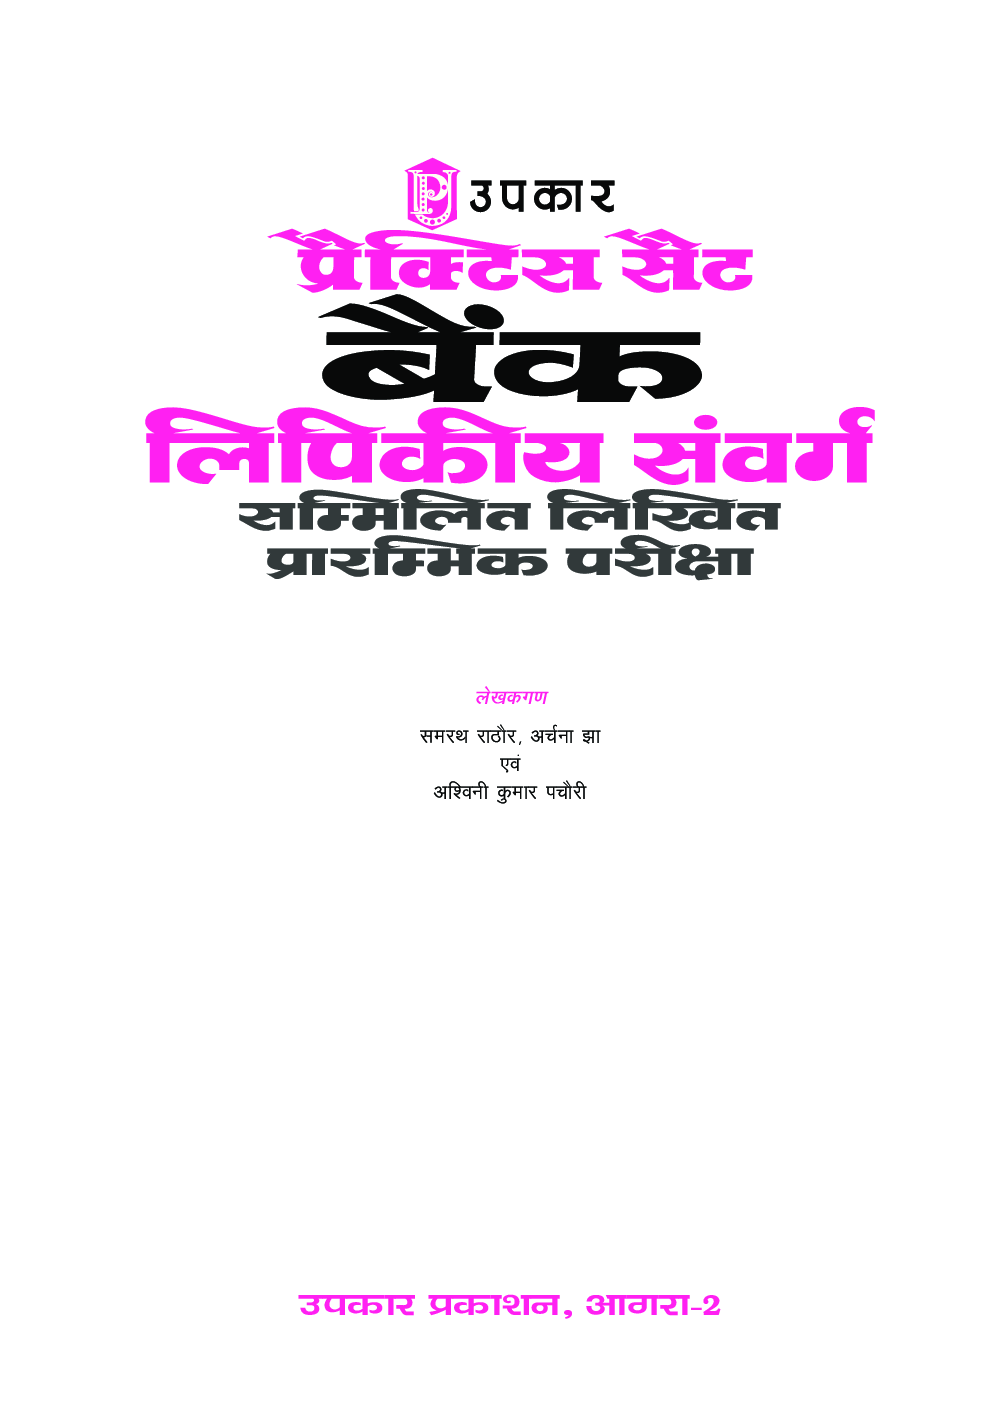 प्रैक्टिस सेट बैंक लिपिकीय संवर्ग सम्मिलित लिखित प्रारंभिक परीक्षा - Page 2